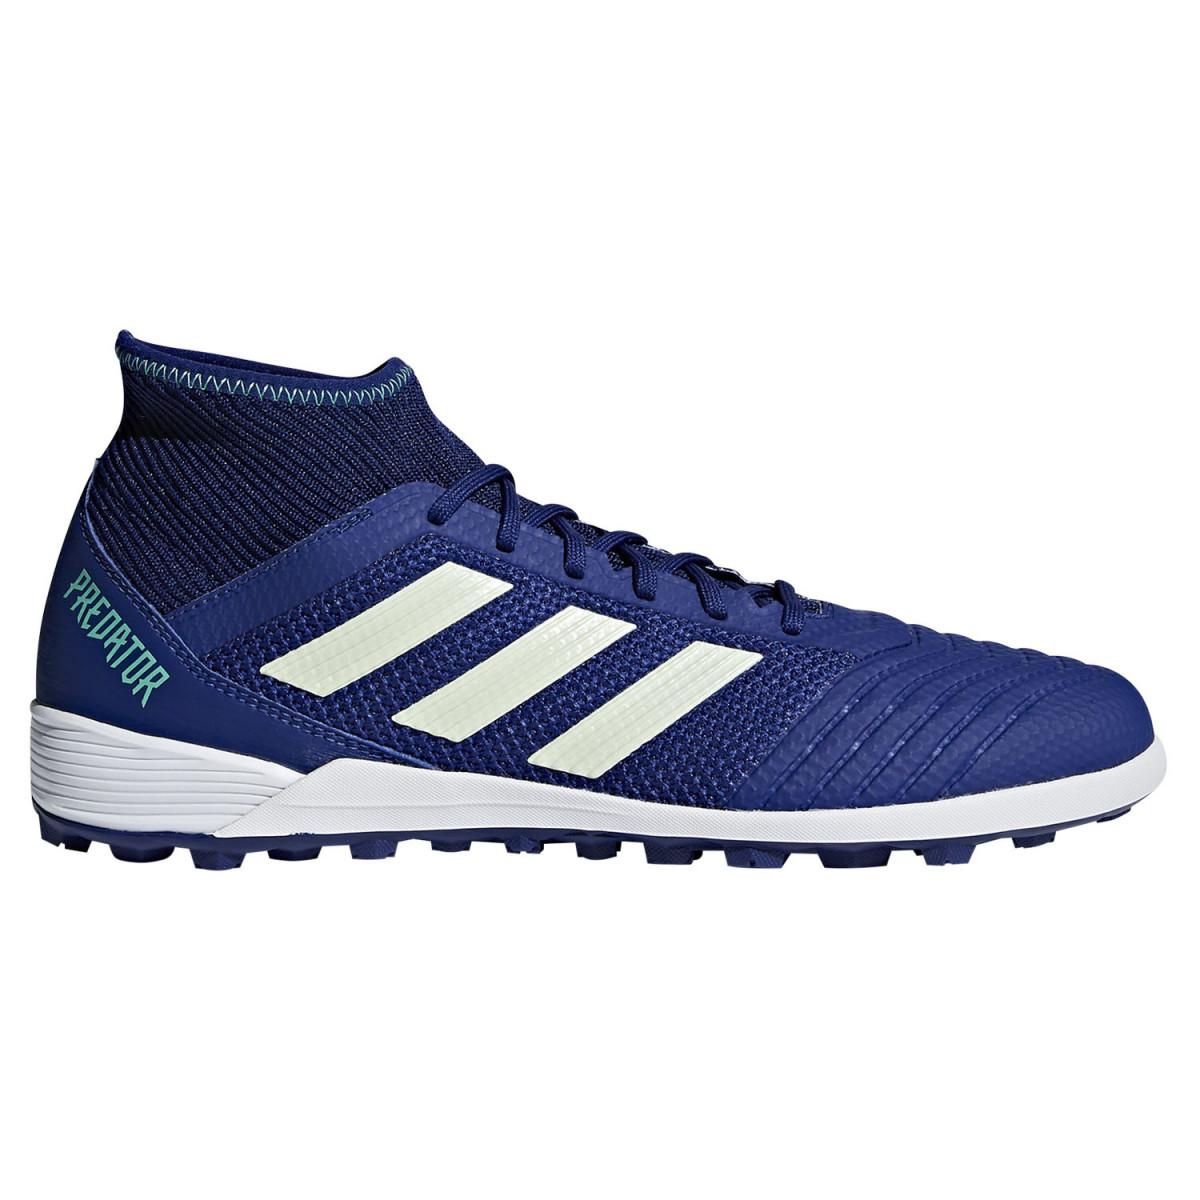 Botines Adidas Predator Tango 18.3 Tf - Botines - Hombre 358b3c6609603